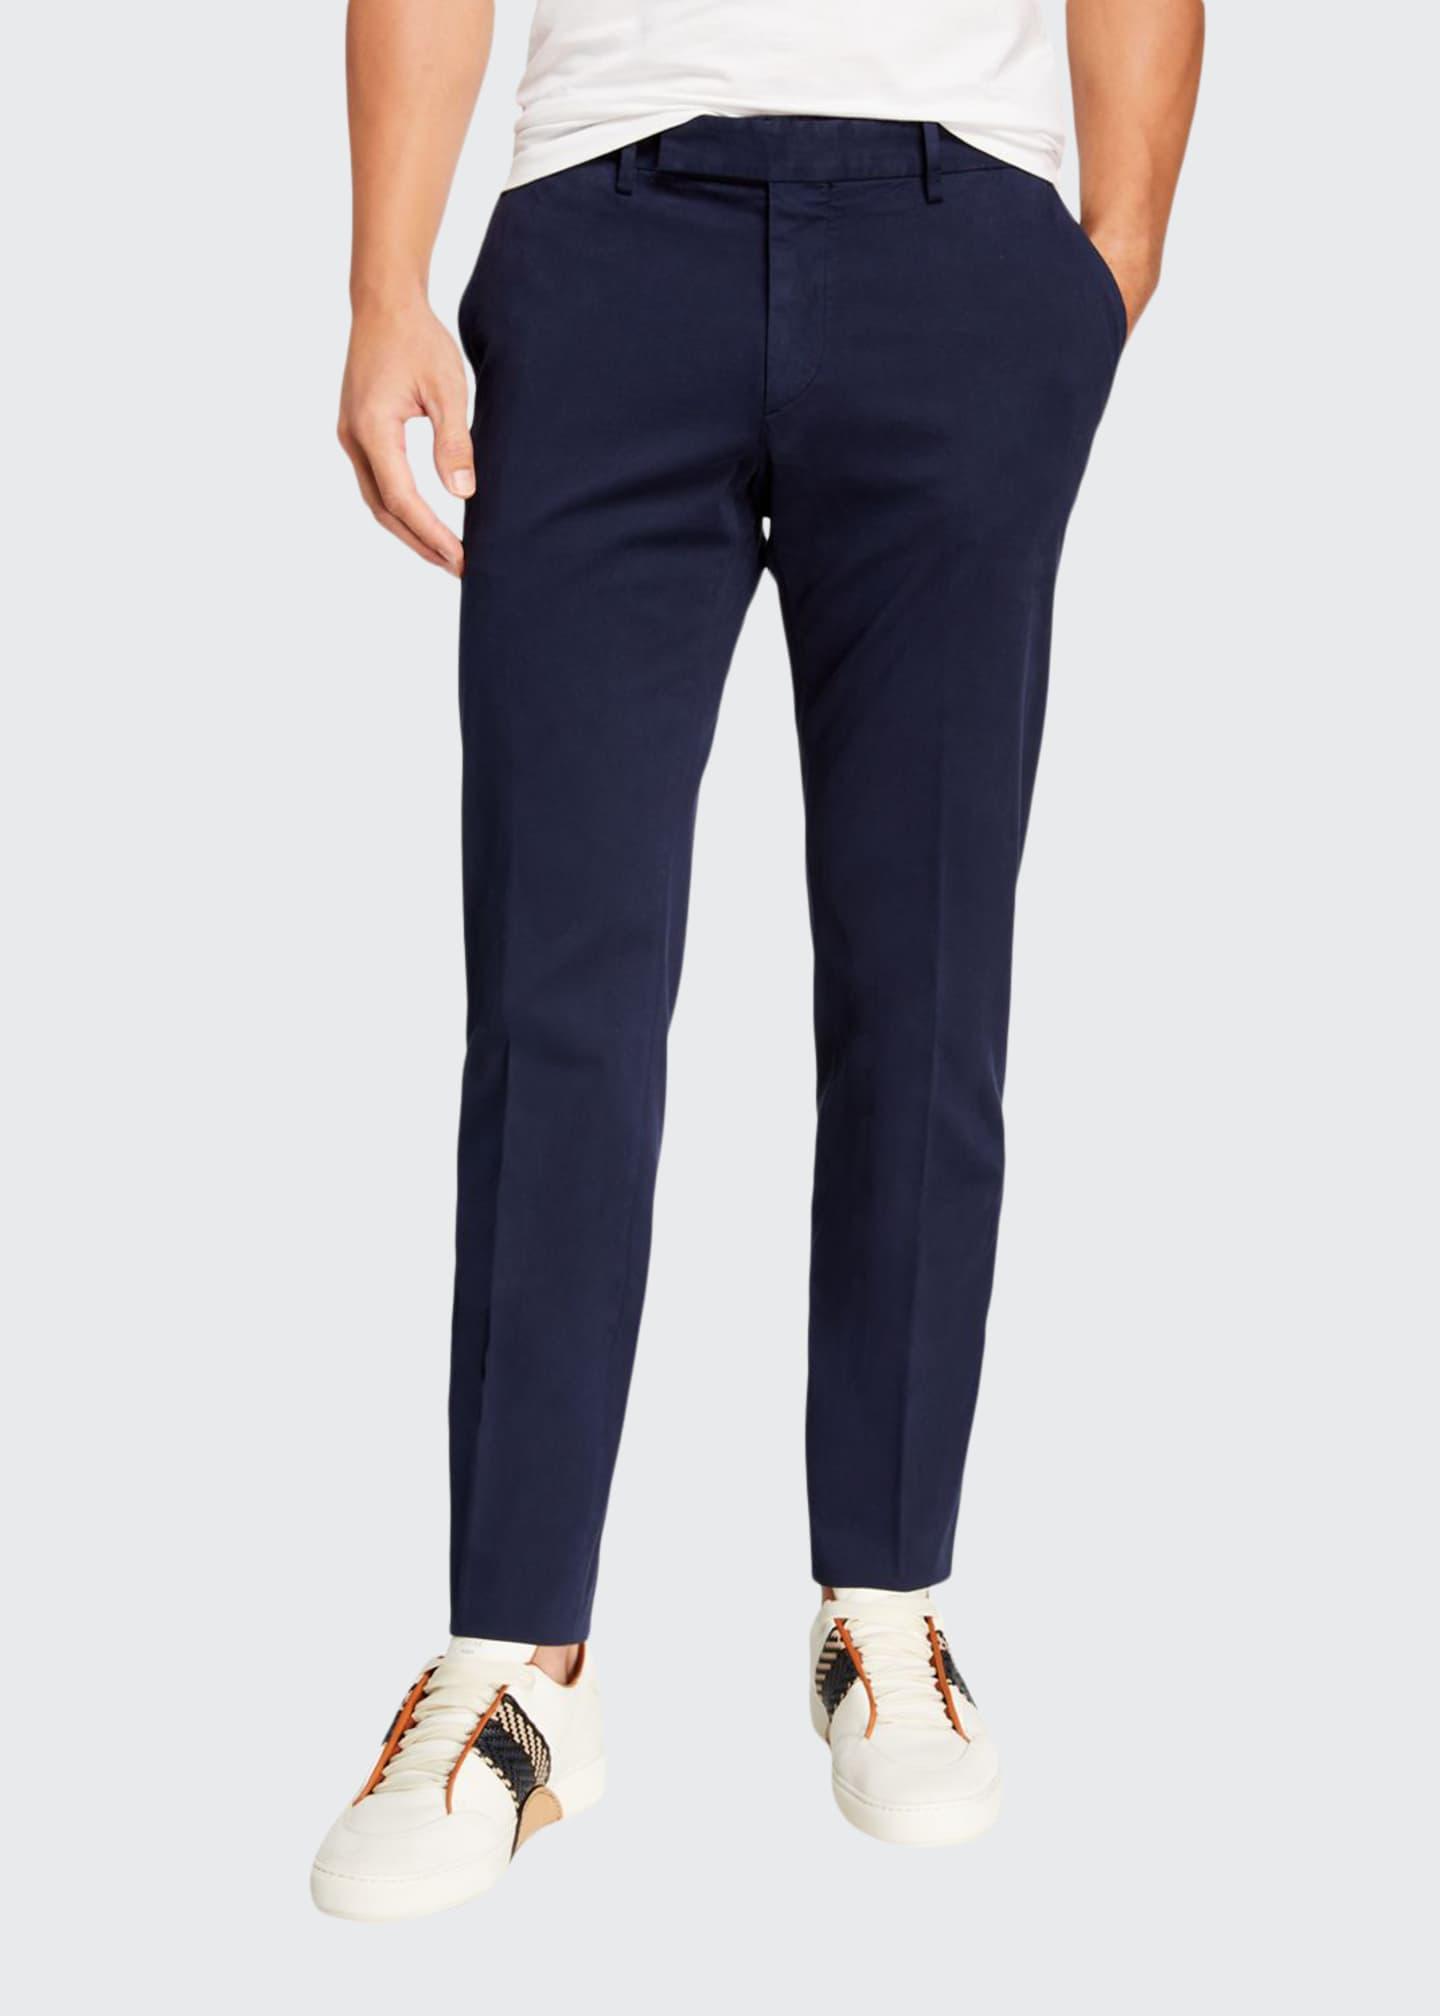 Ermenegildo Zegna Men's Garment-Dyed Tab Twill Pants, Navy